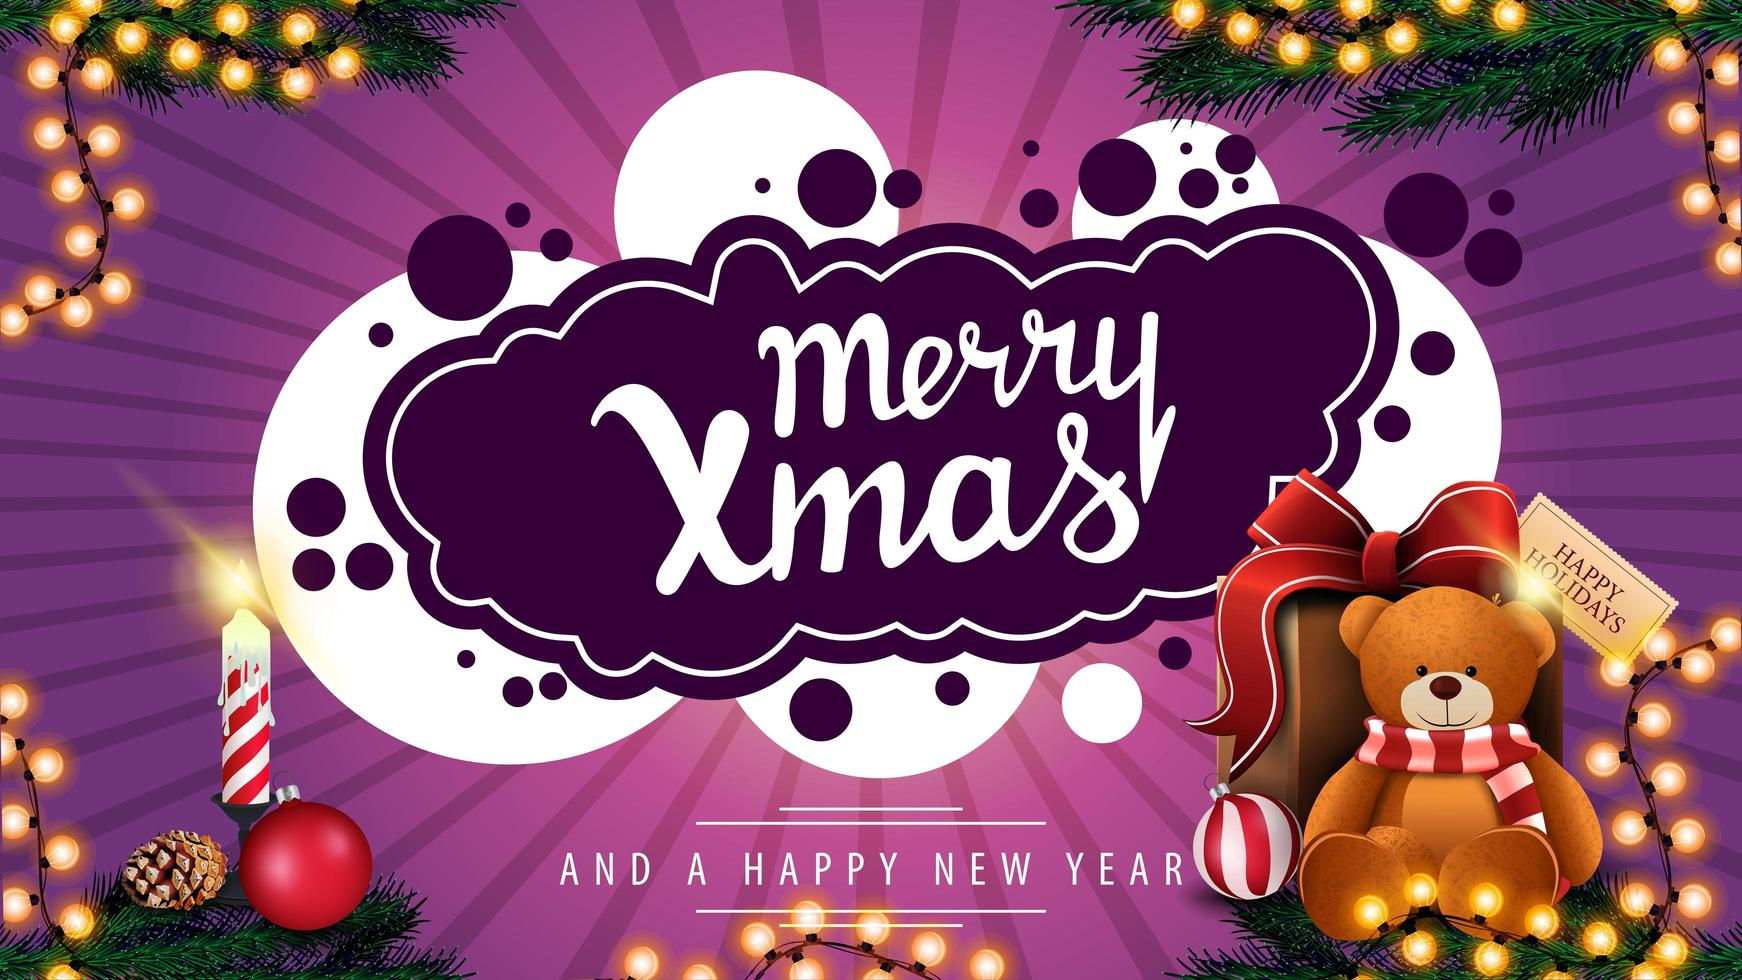 vrolijk kerstfeest, paarse ansichtkaart met slinger, kaars en cadeau met teddybeer vector